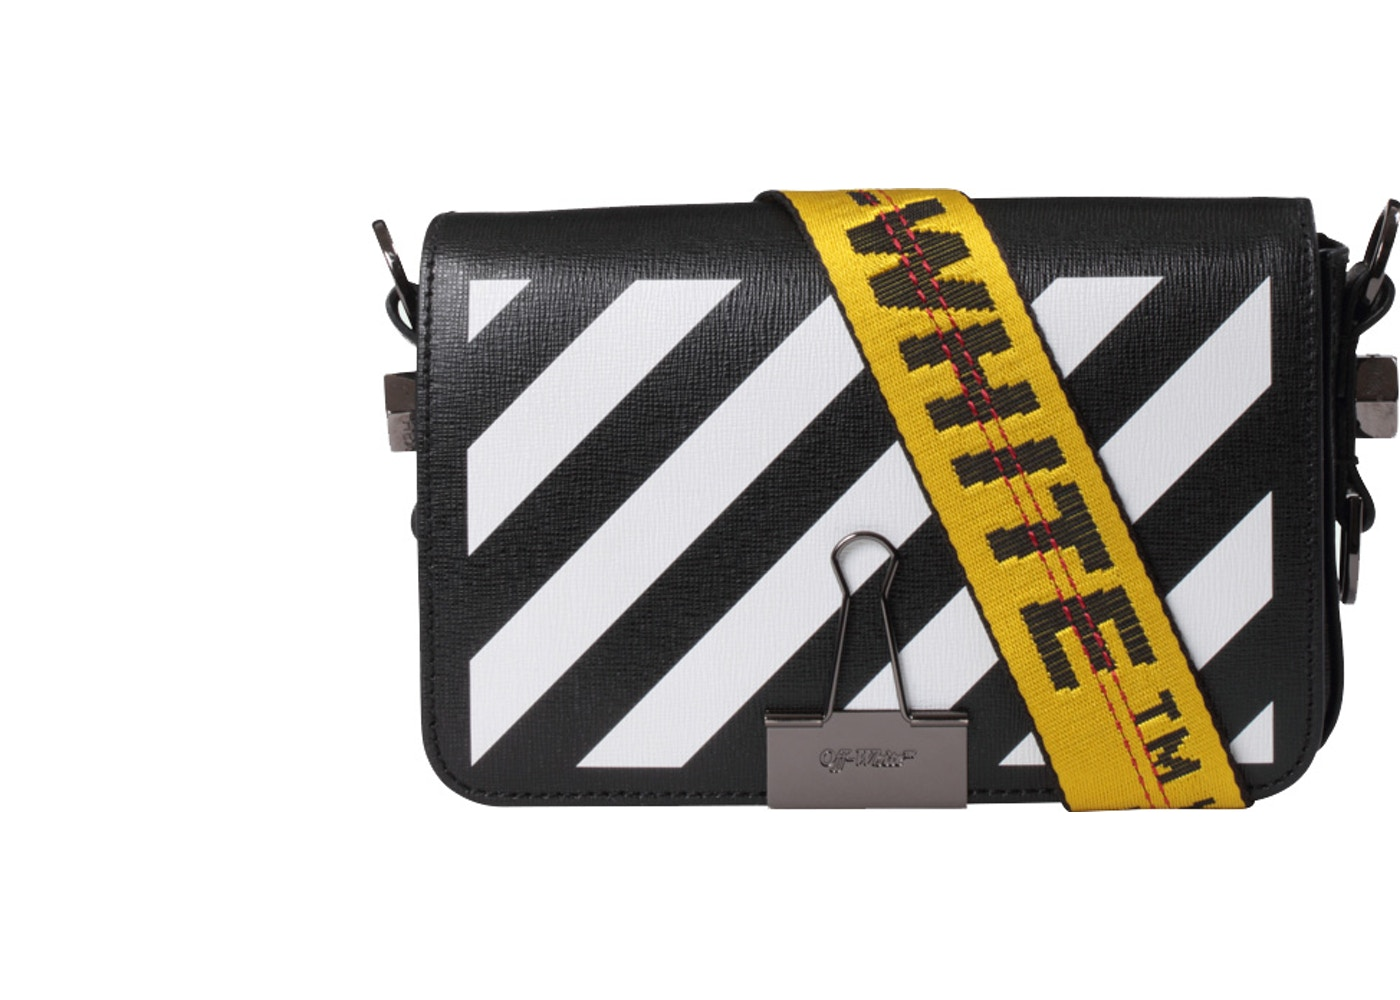 bf2b941b OFF-WHITE Binder Clip Bag Diag Mini Black White Yellow. Diag Mini Black  White Yellow